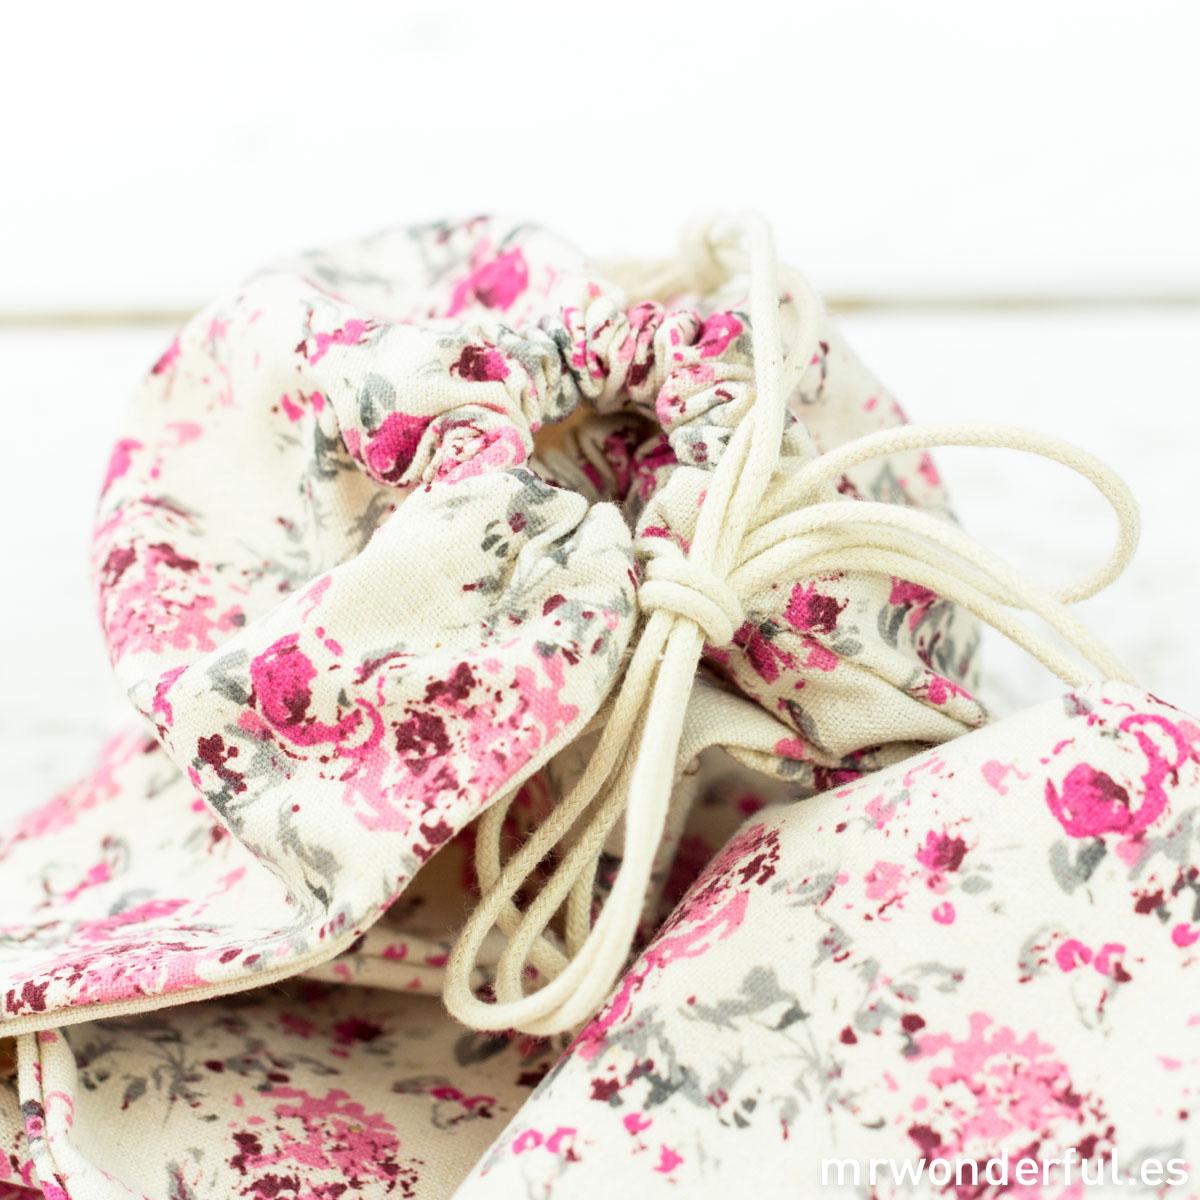 mrwonderful_59890_bolsa-tela-estampado-floral-13